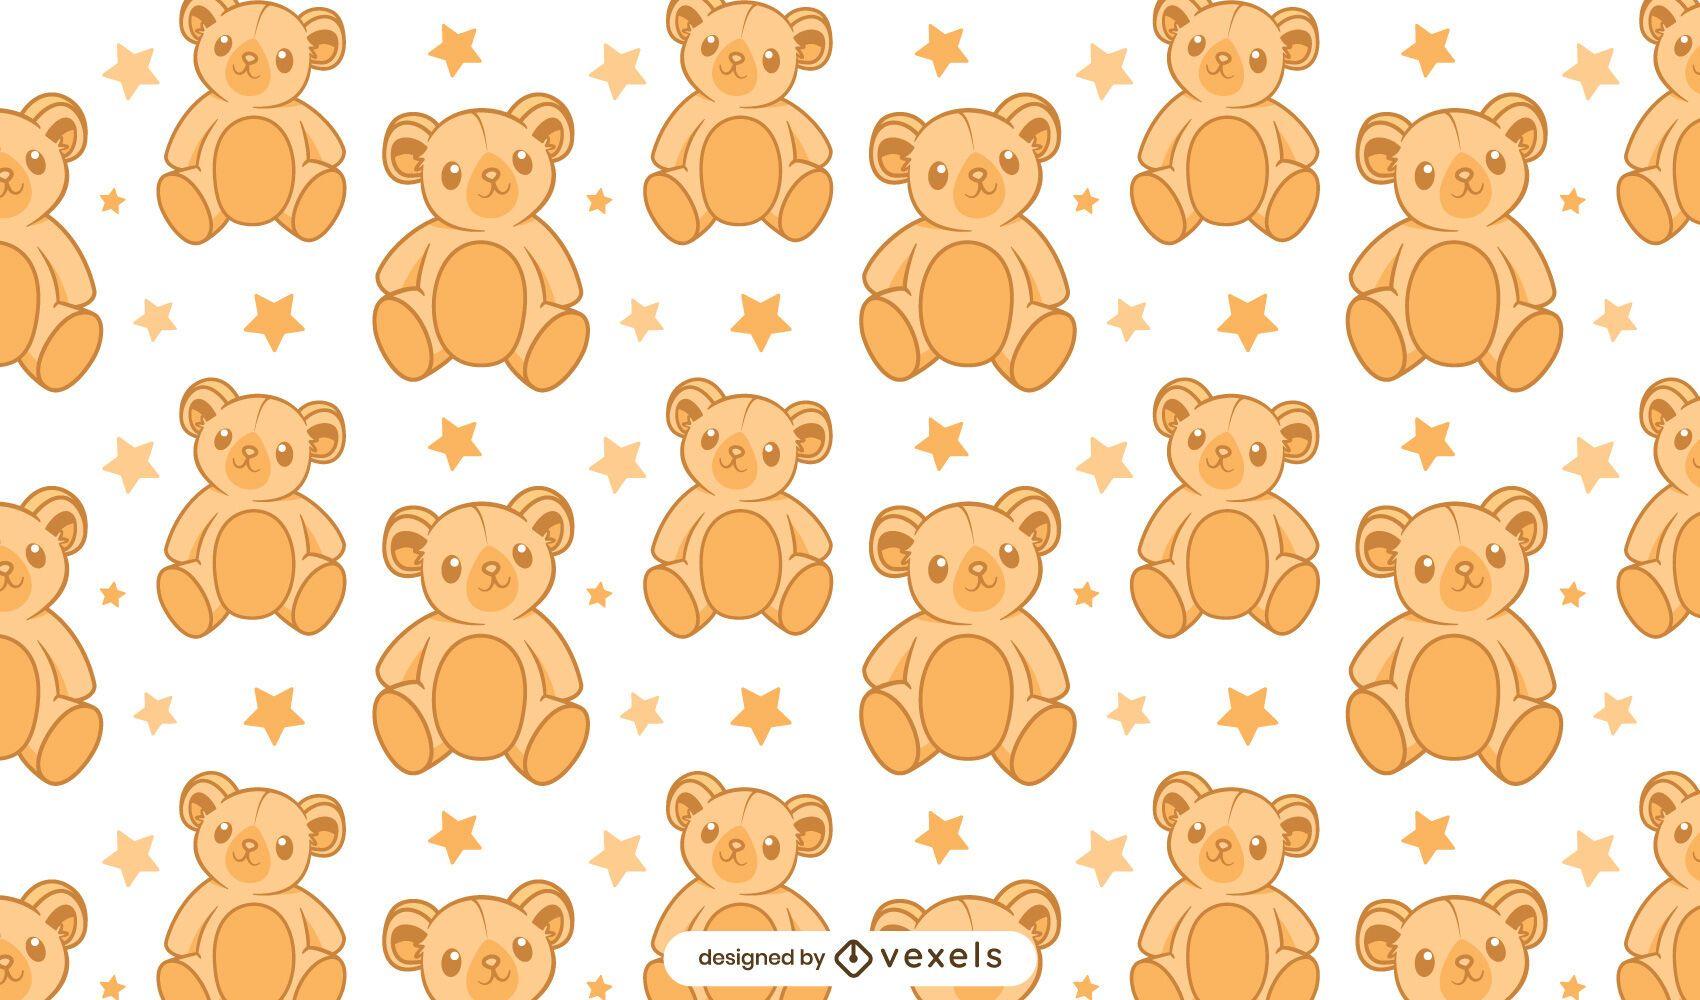 Teddy bear pattern design